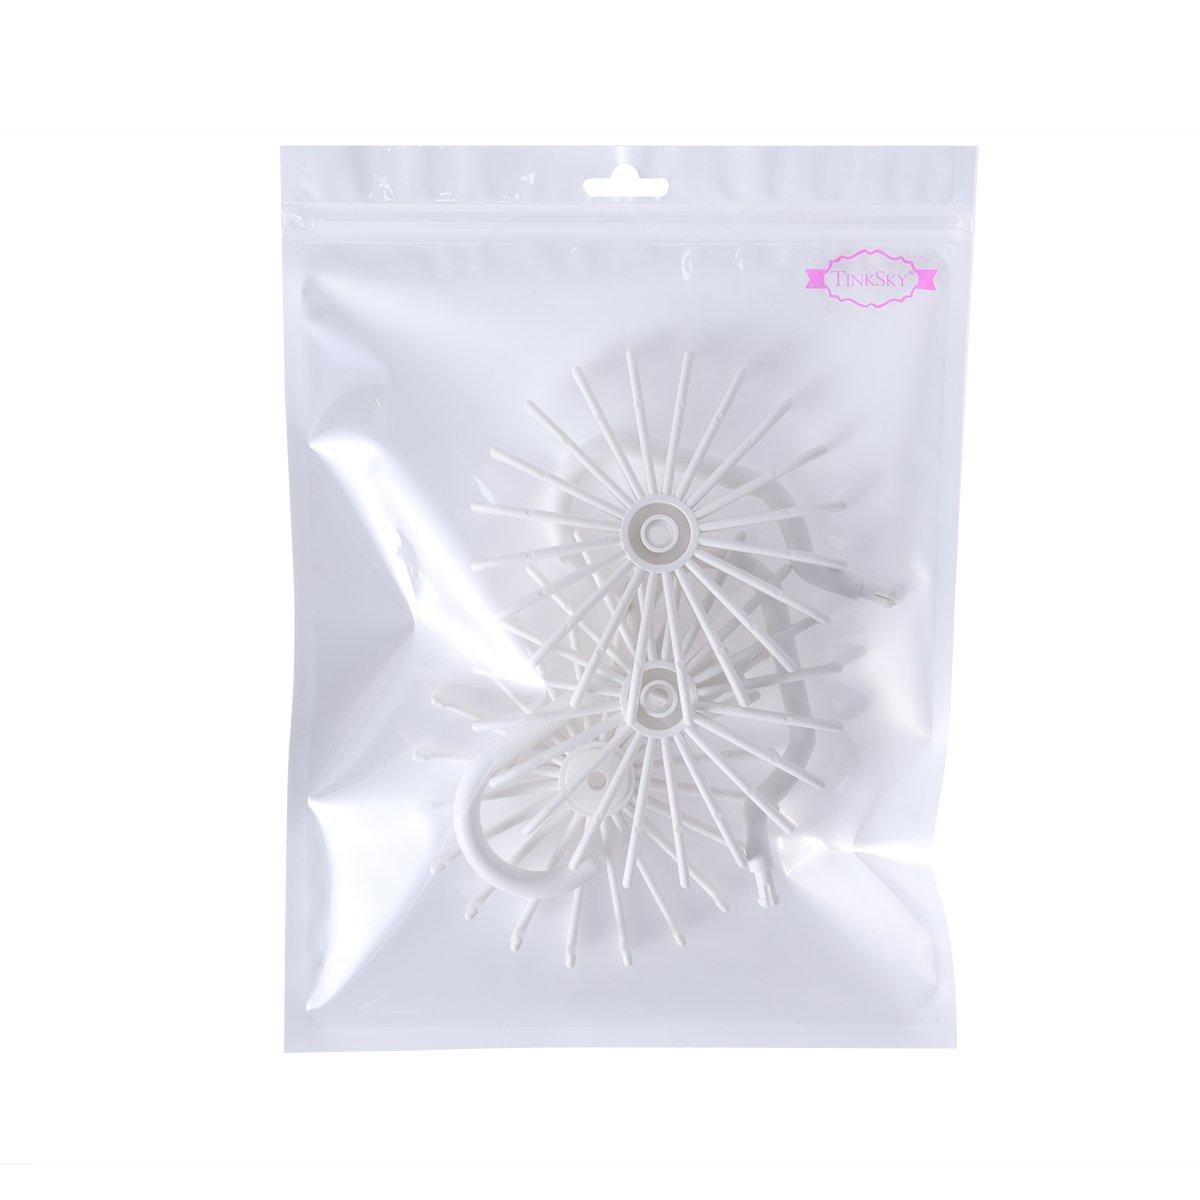 c92c0ef48b71 ... Tinksky Tie Rack Belt Hanger Scarf Holder Hook for Closet Organizers,  360 Degree Rotating 20 ...